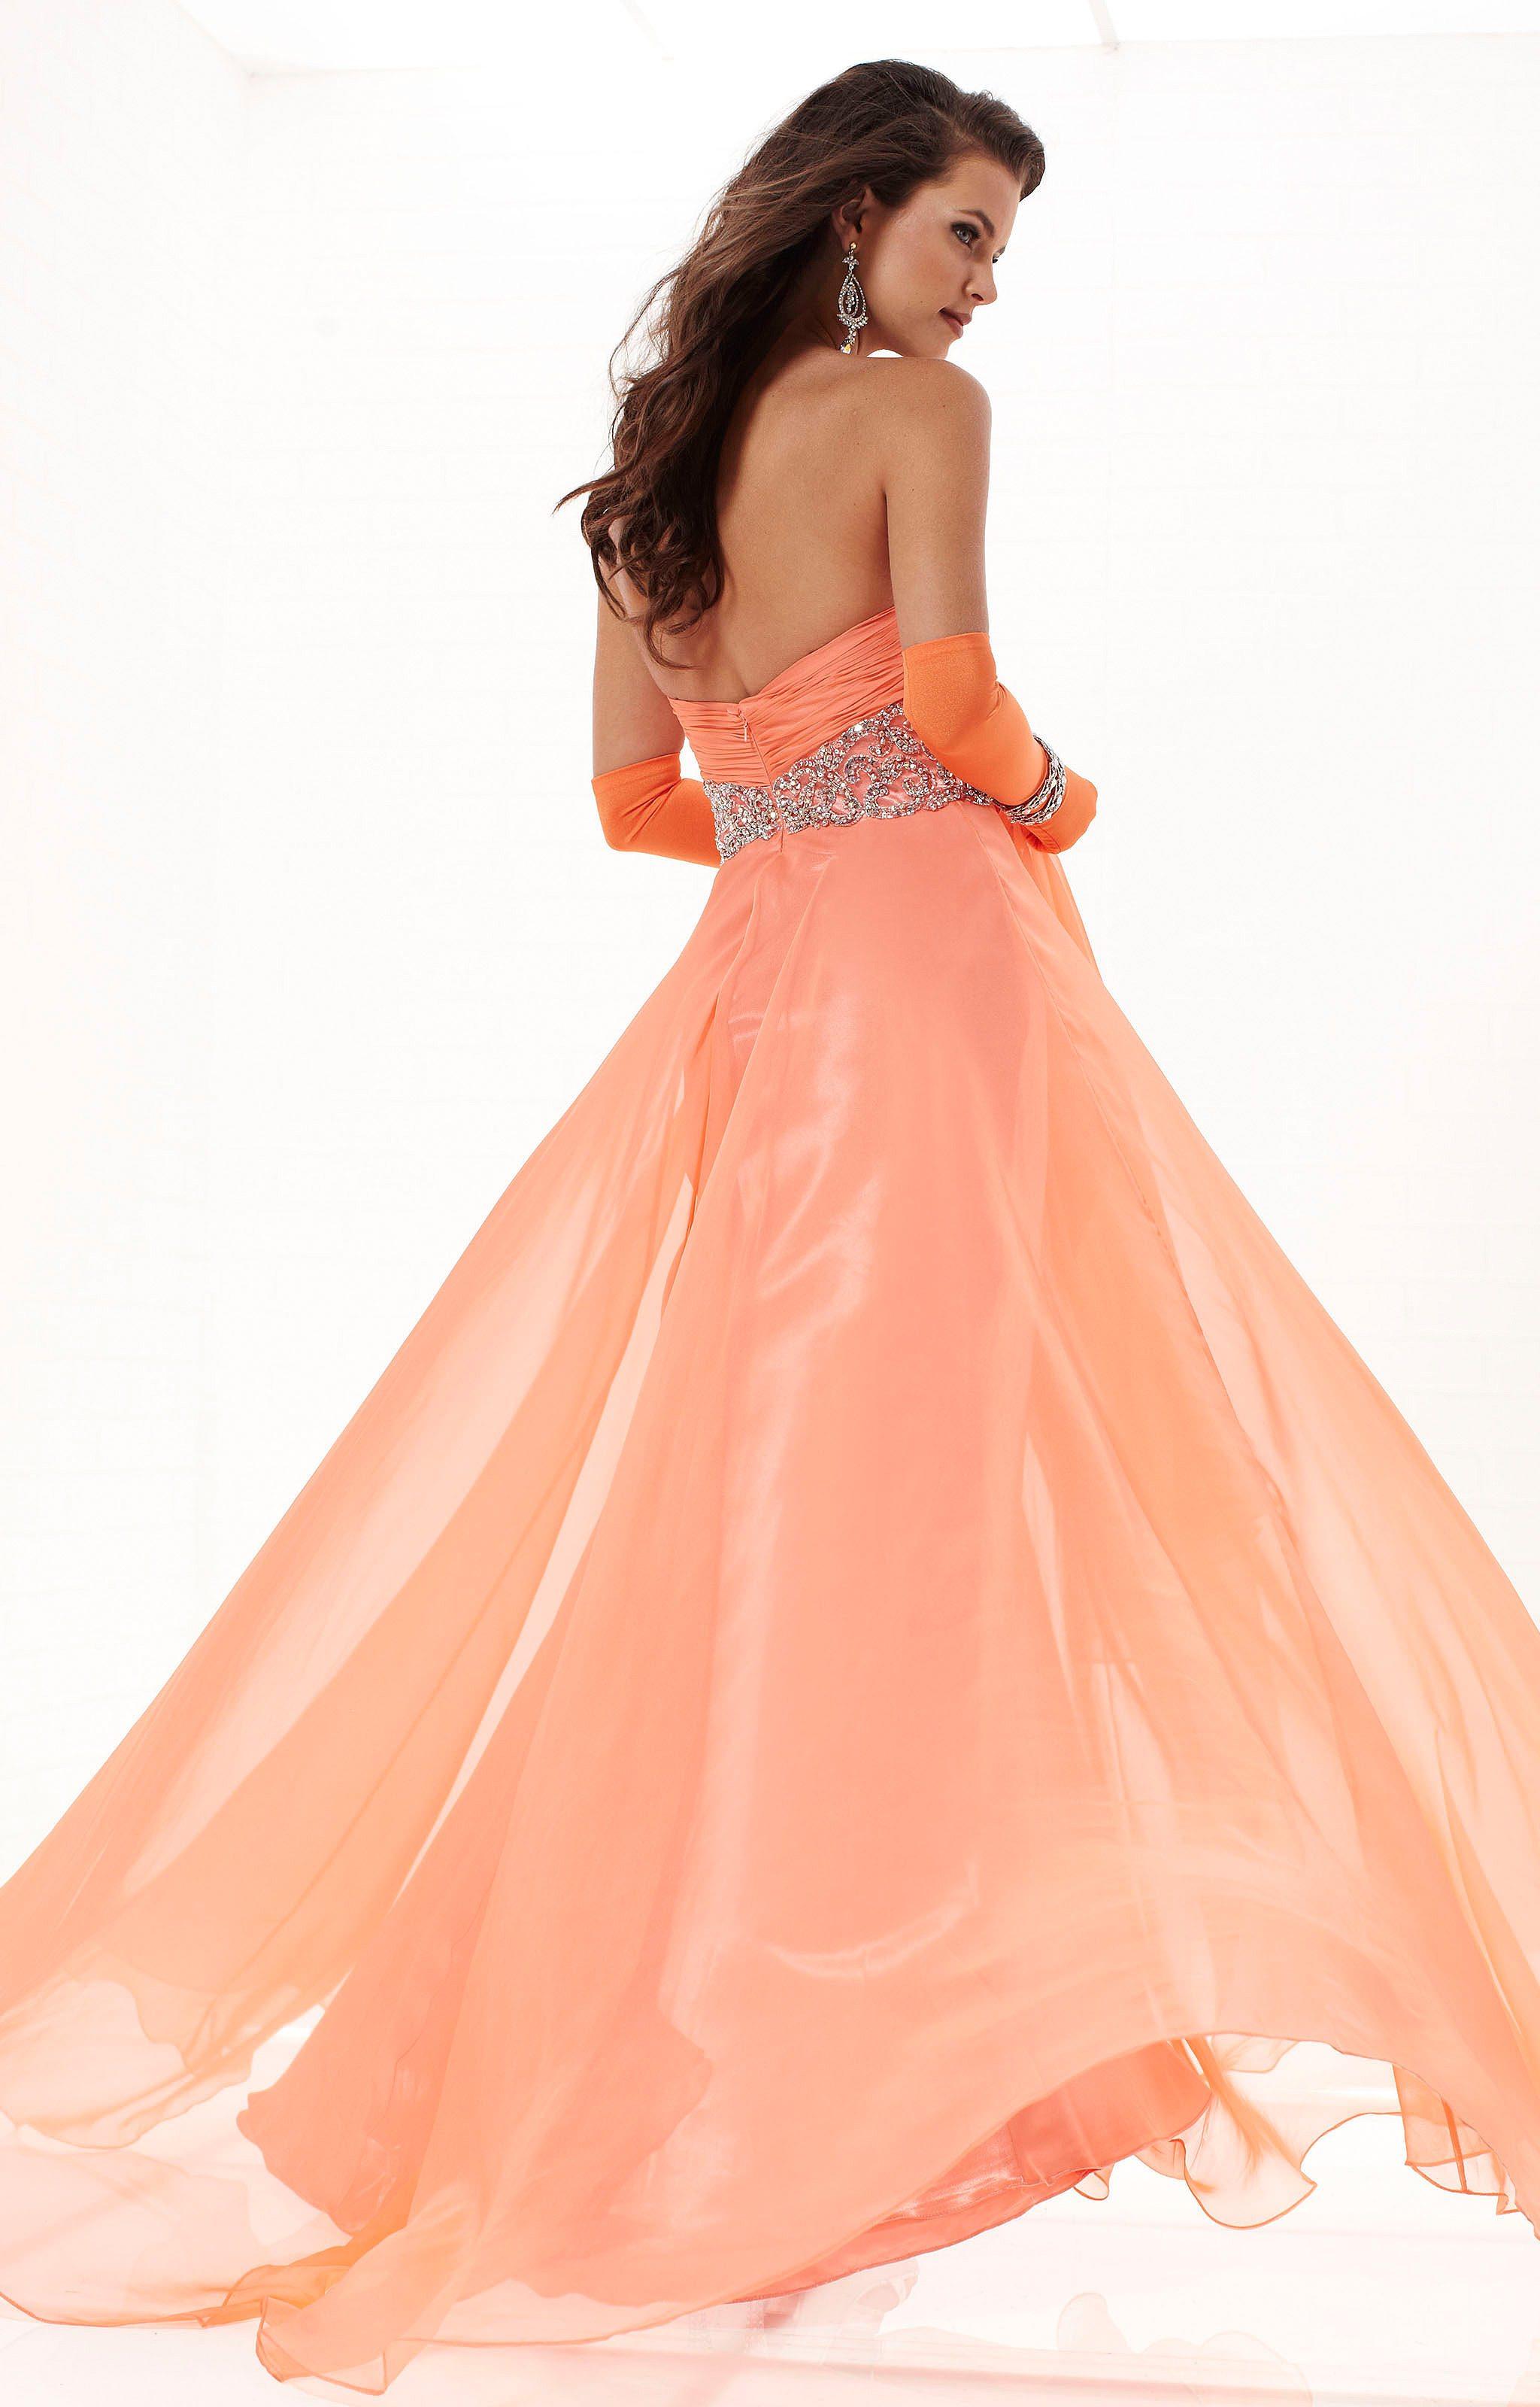 Tiffany Designs 16744  Empire Waist Chiffon Dress Prom Dress